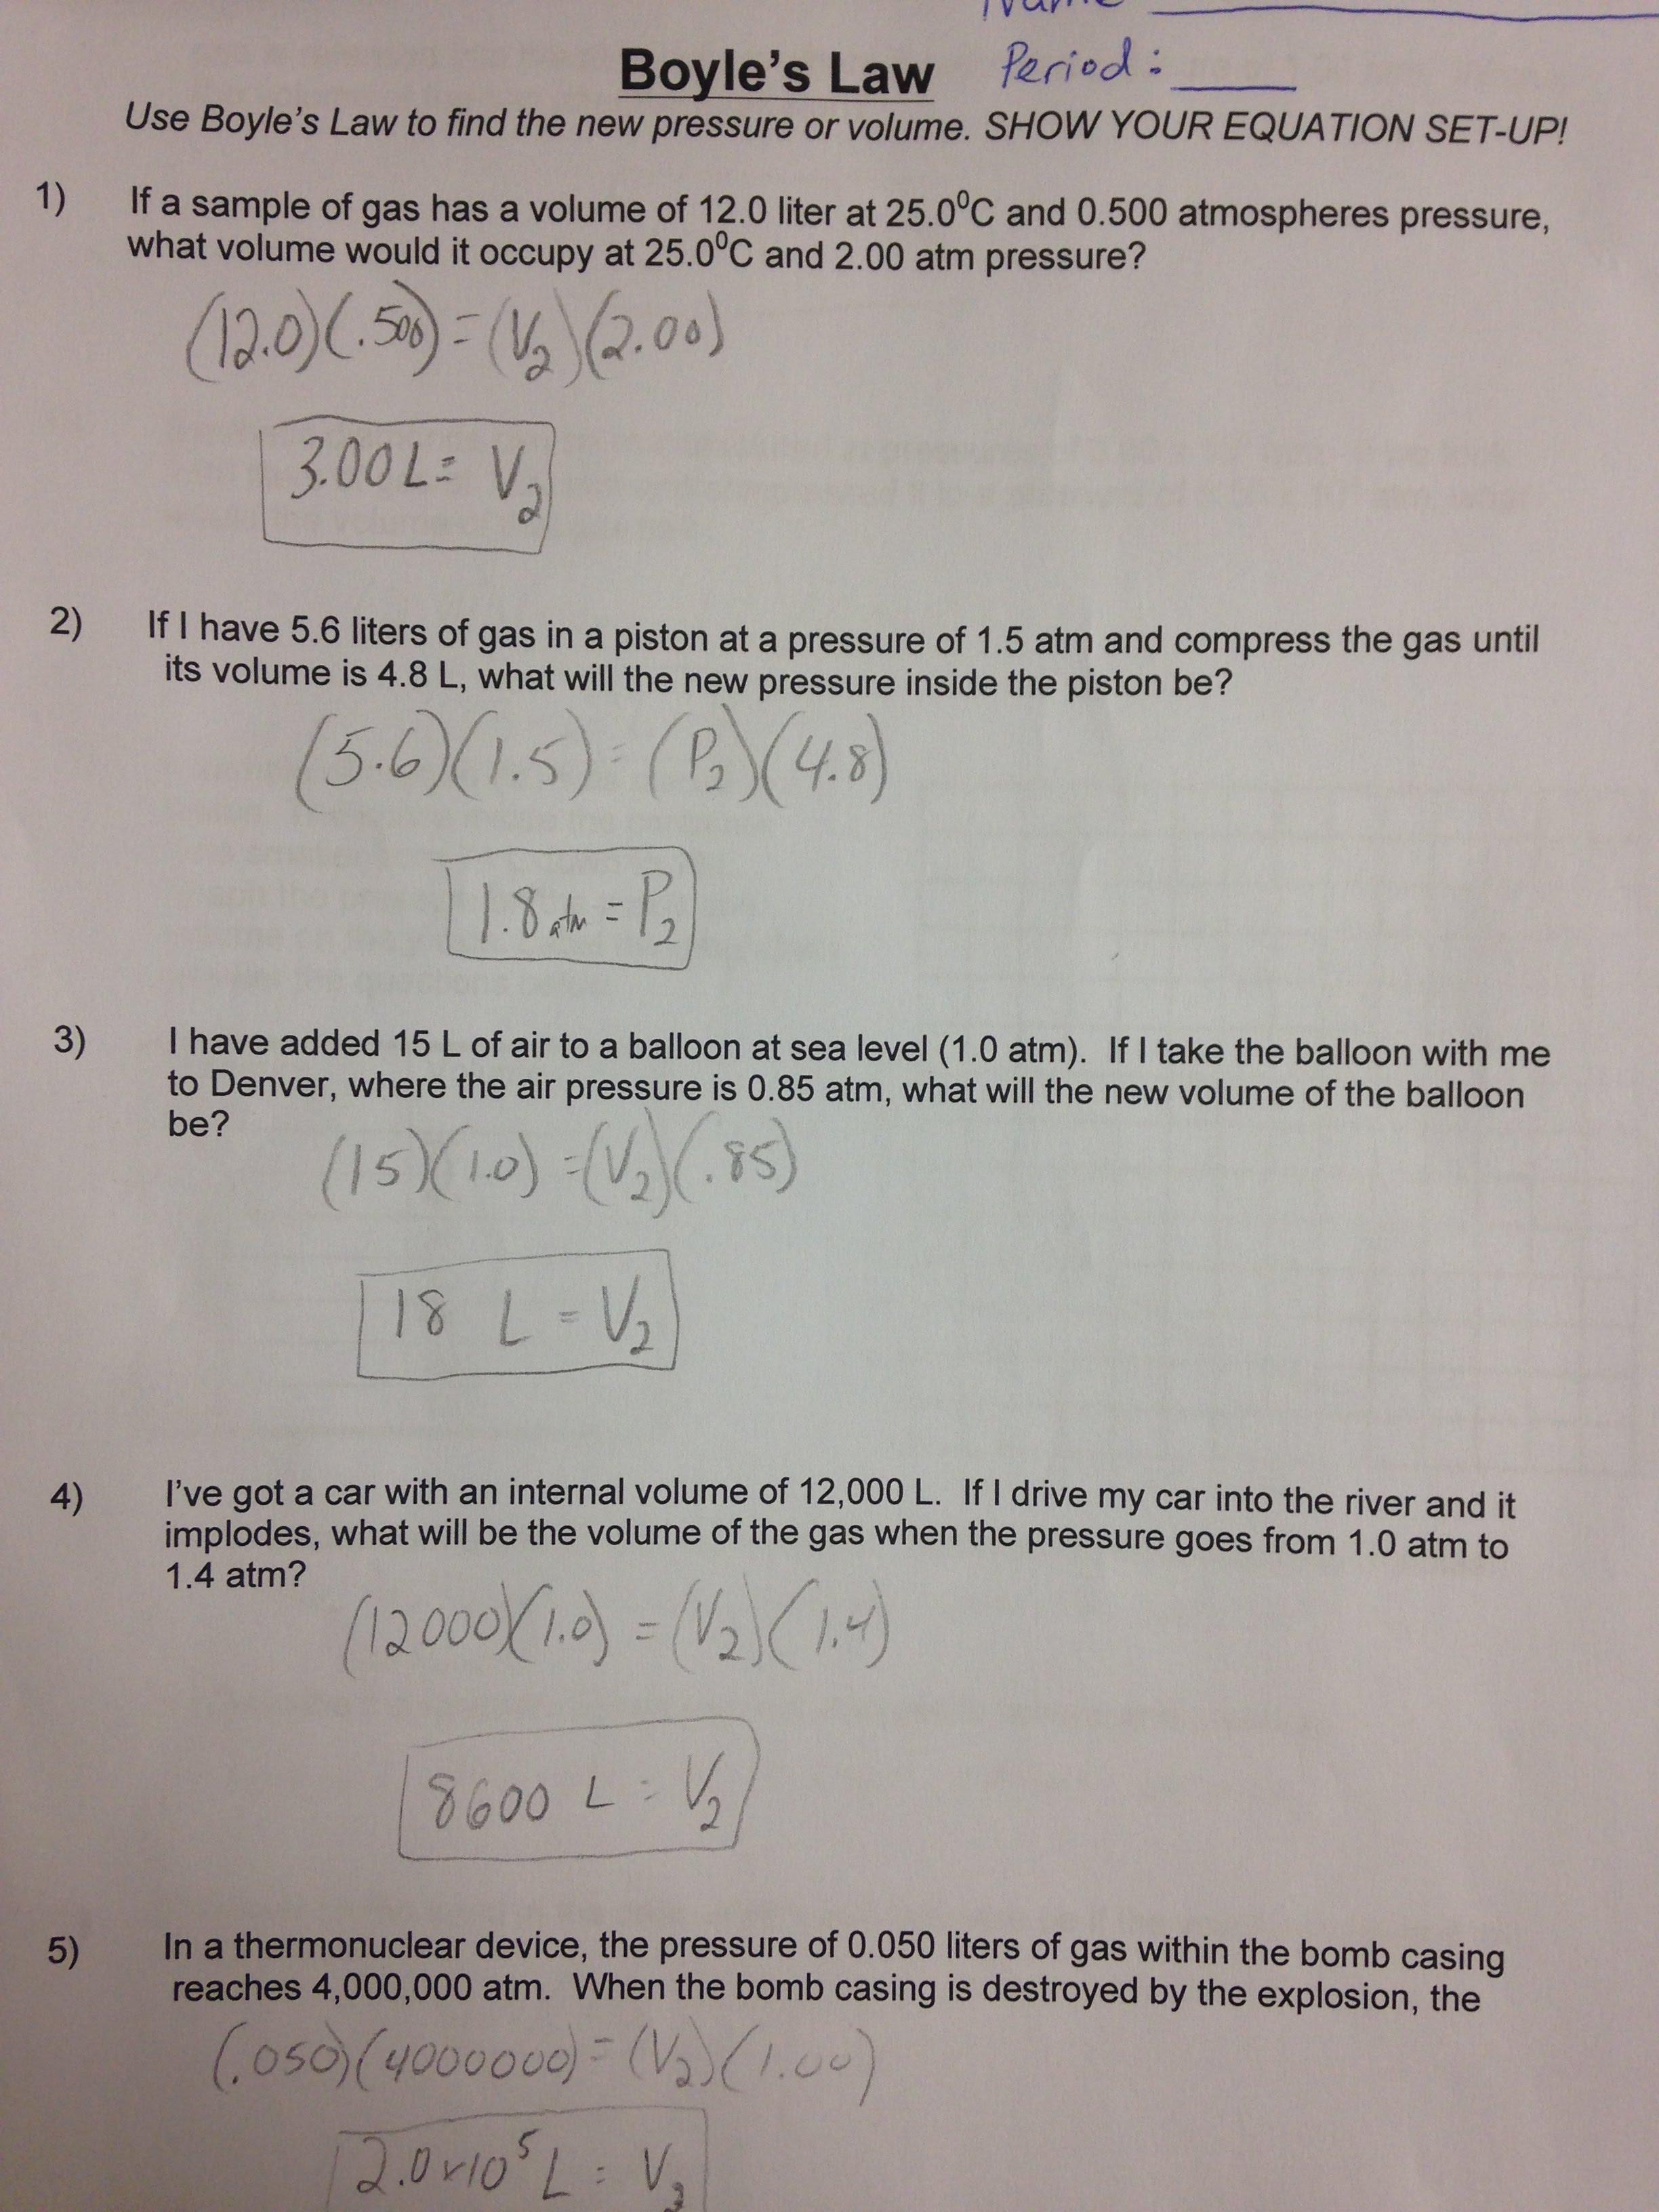 Boyle's Law Practice Answer Key